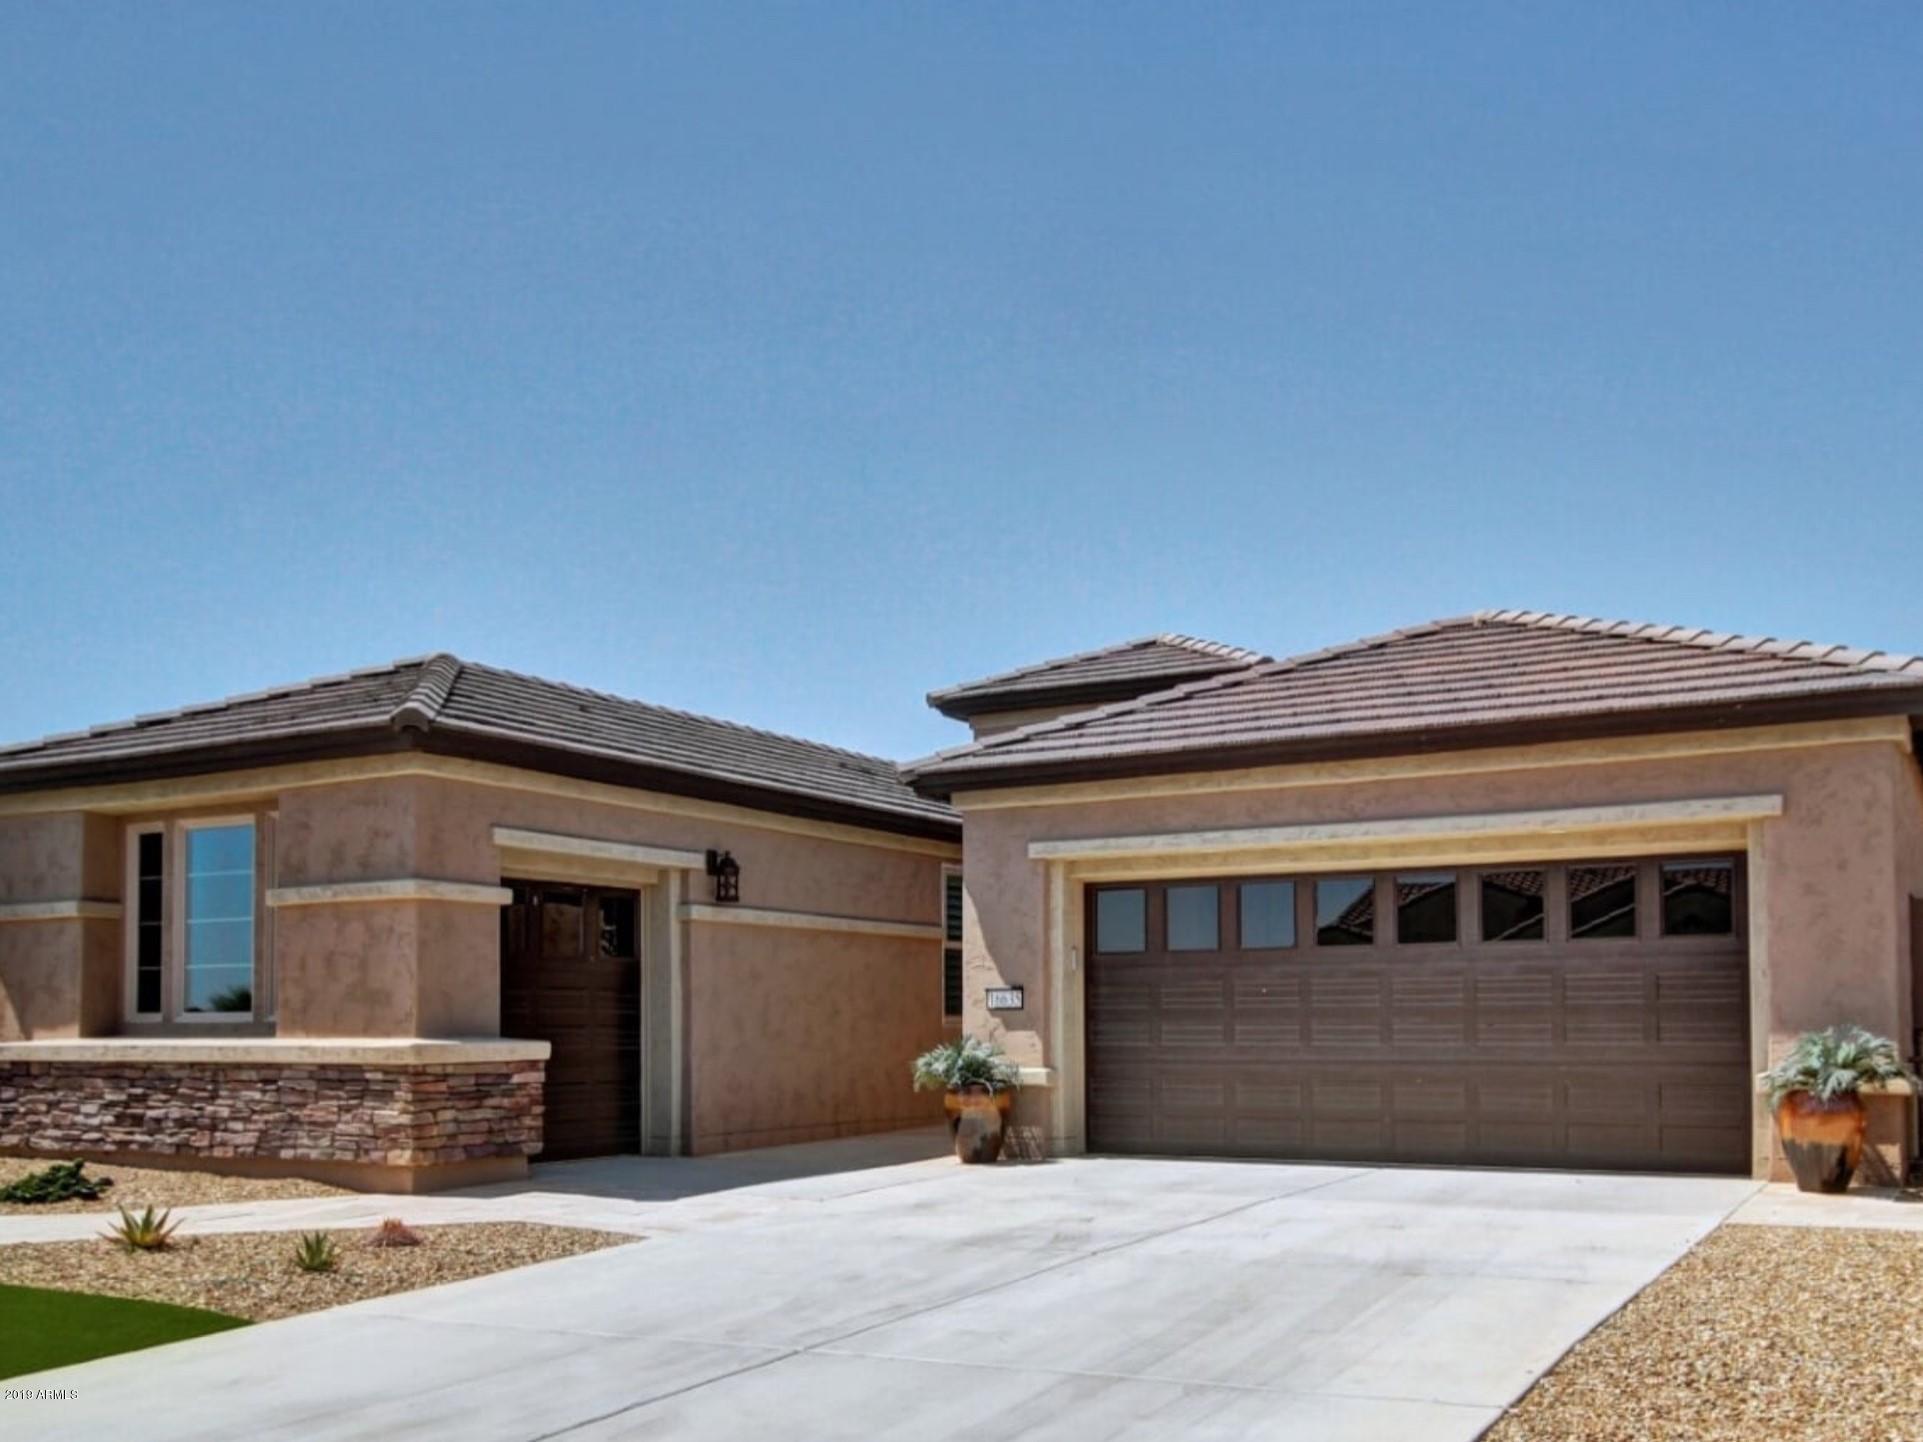 Photo of 16635 W MONTE VISTA Road W, Goodyear, AZ 85395